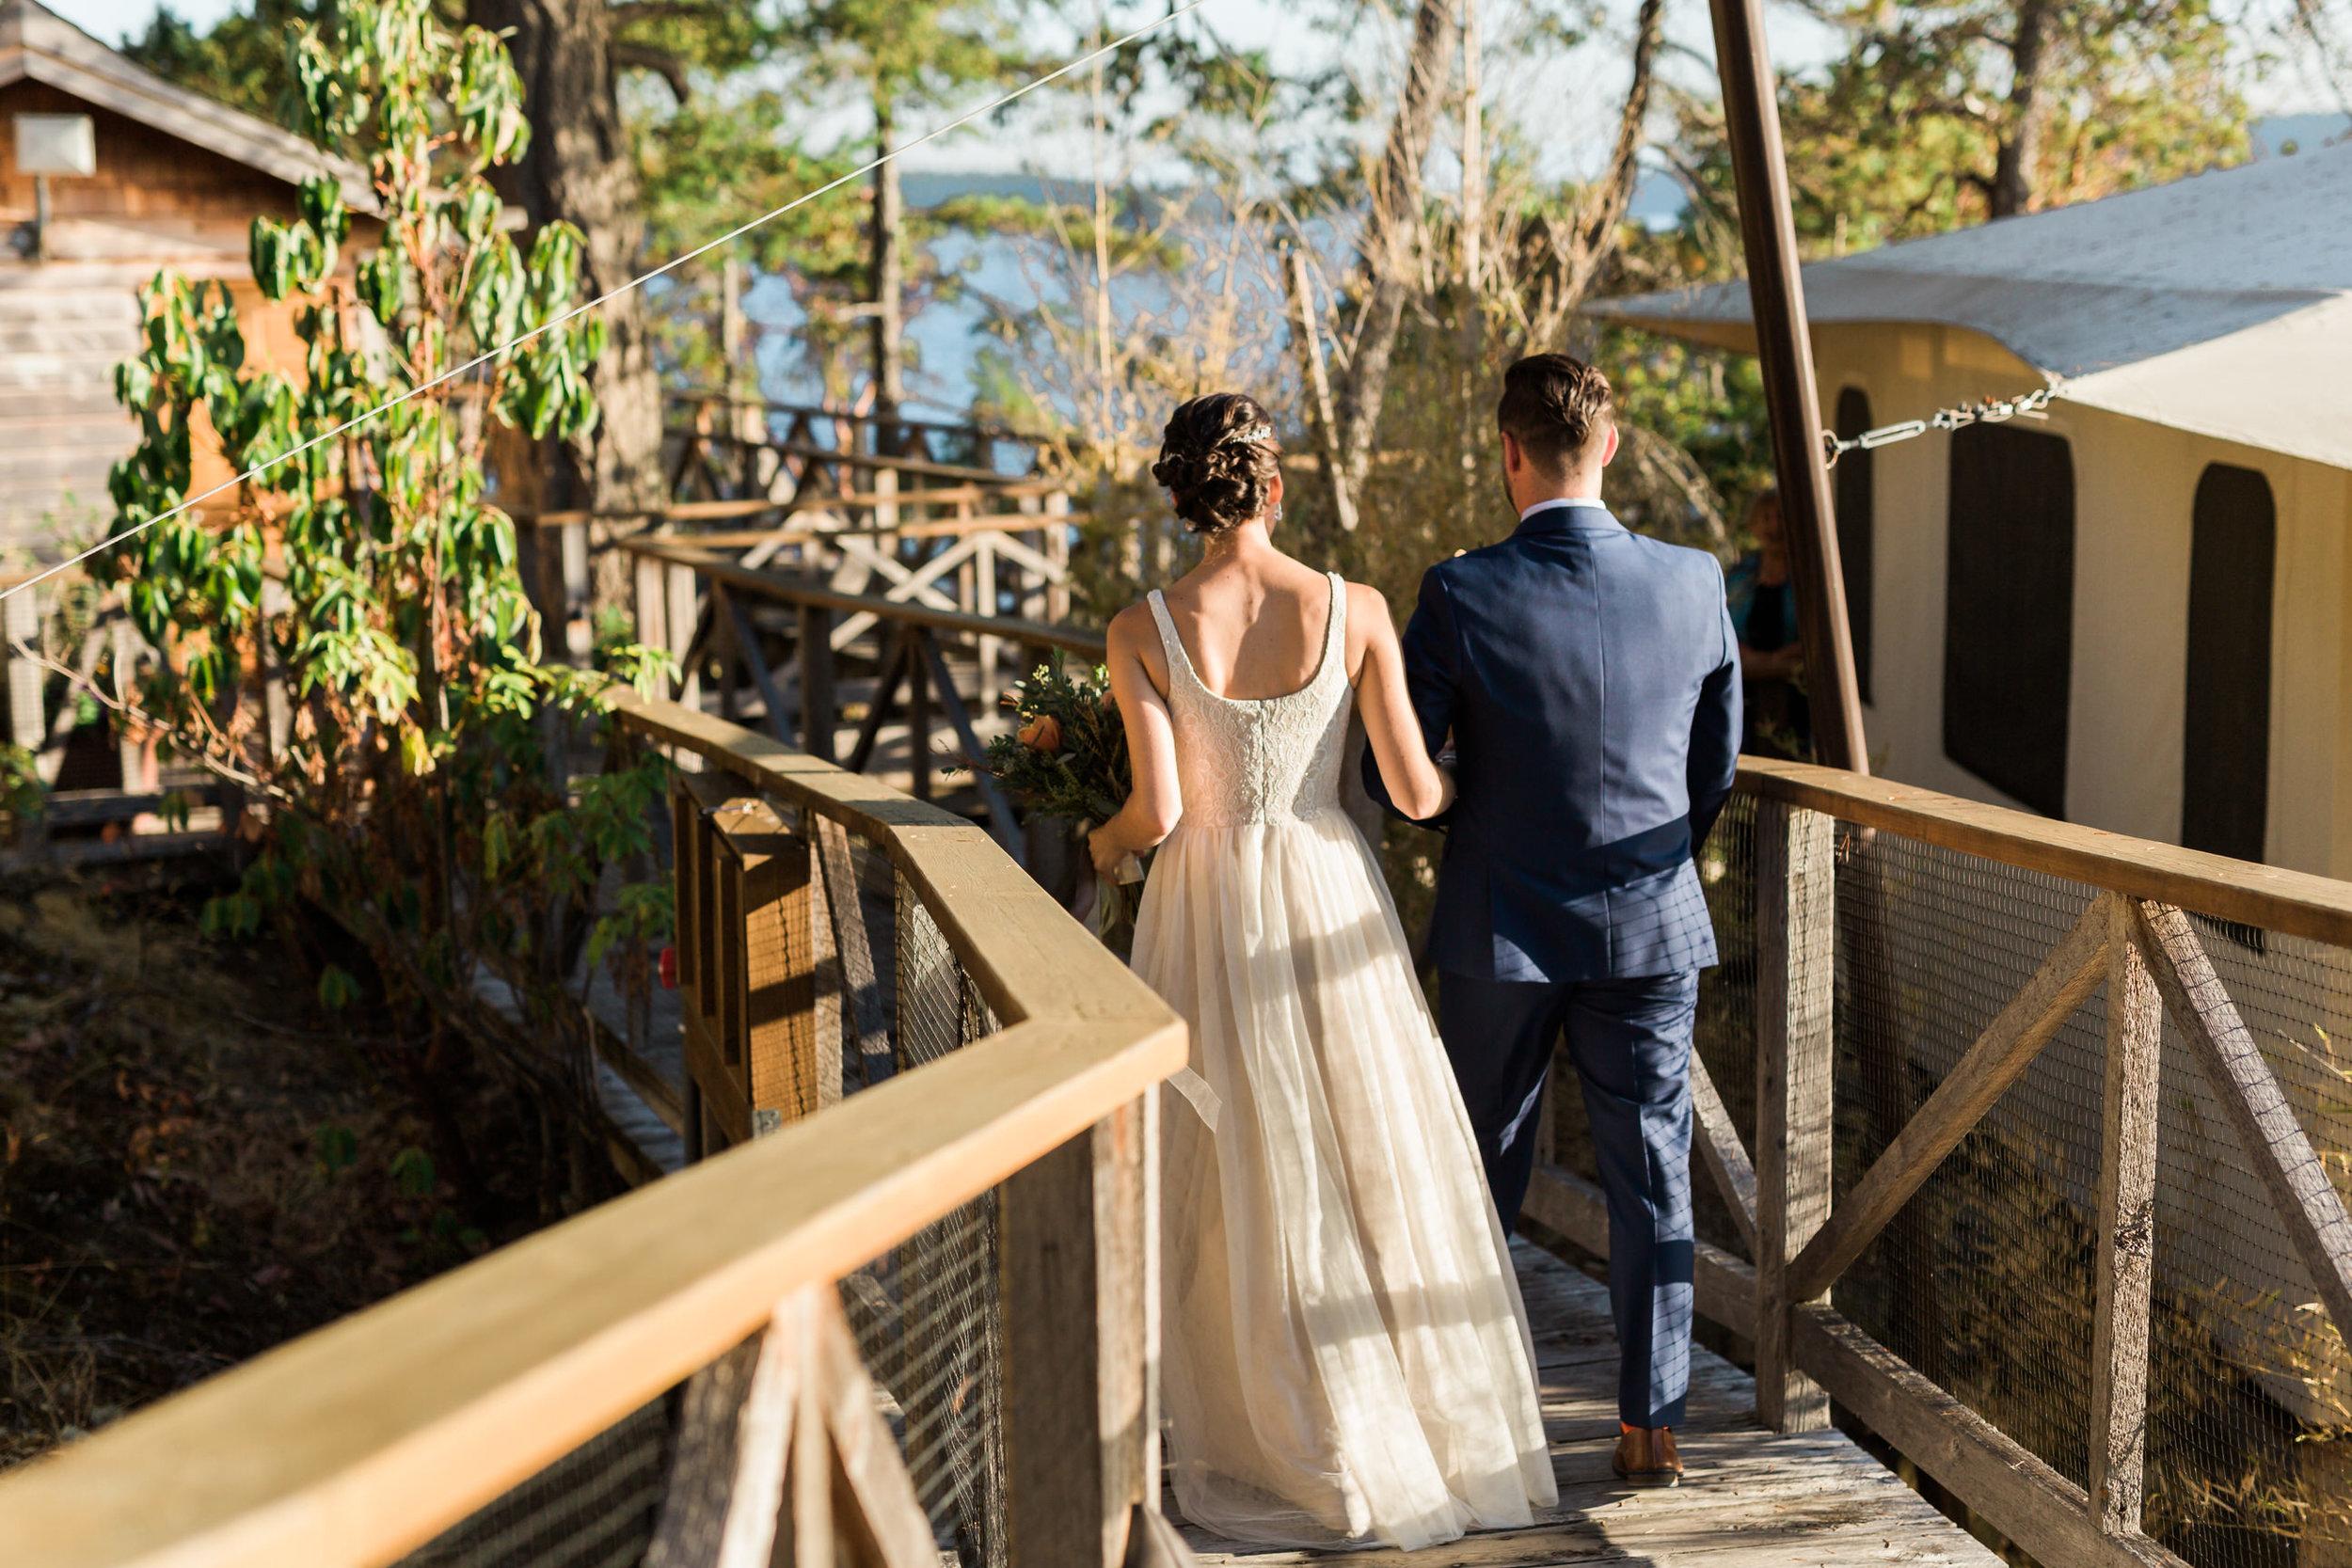 Rockwater Secret Cove Resort Wedding - Sunshine Coast BC Wedding Photographer - Vancouver Wedding Photographer - Sunshine Coast Elopement Photos - IMG_0300.jpg